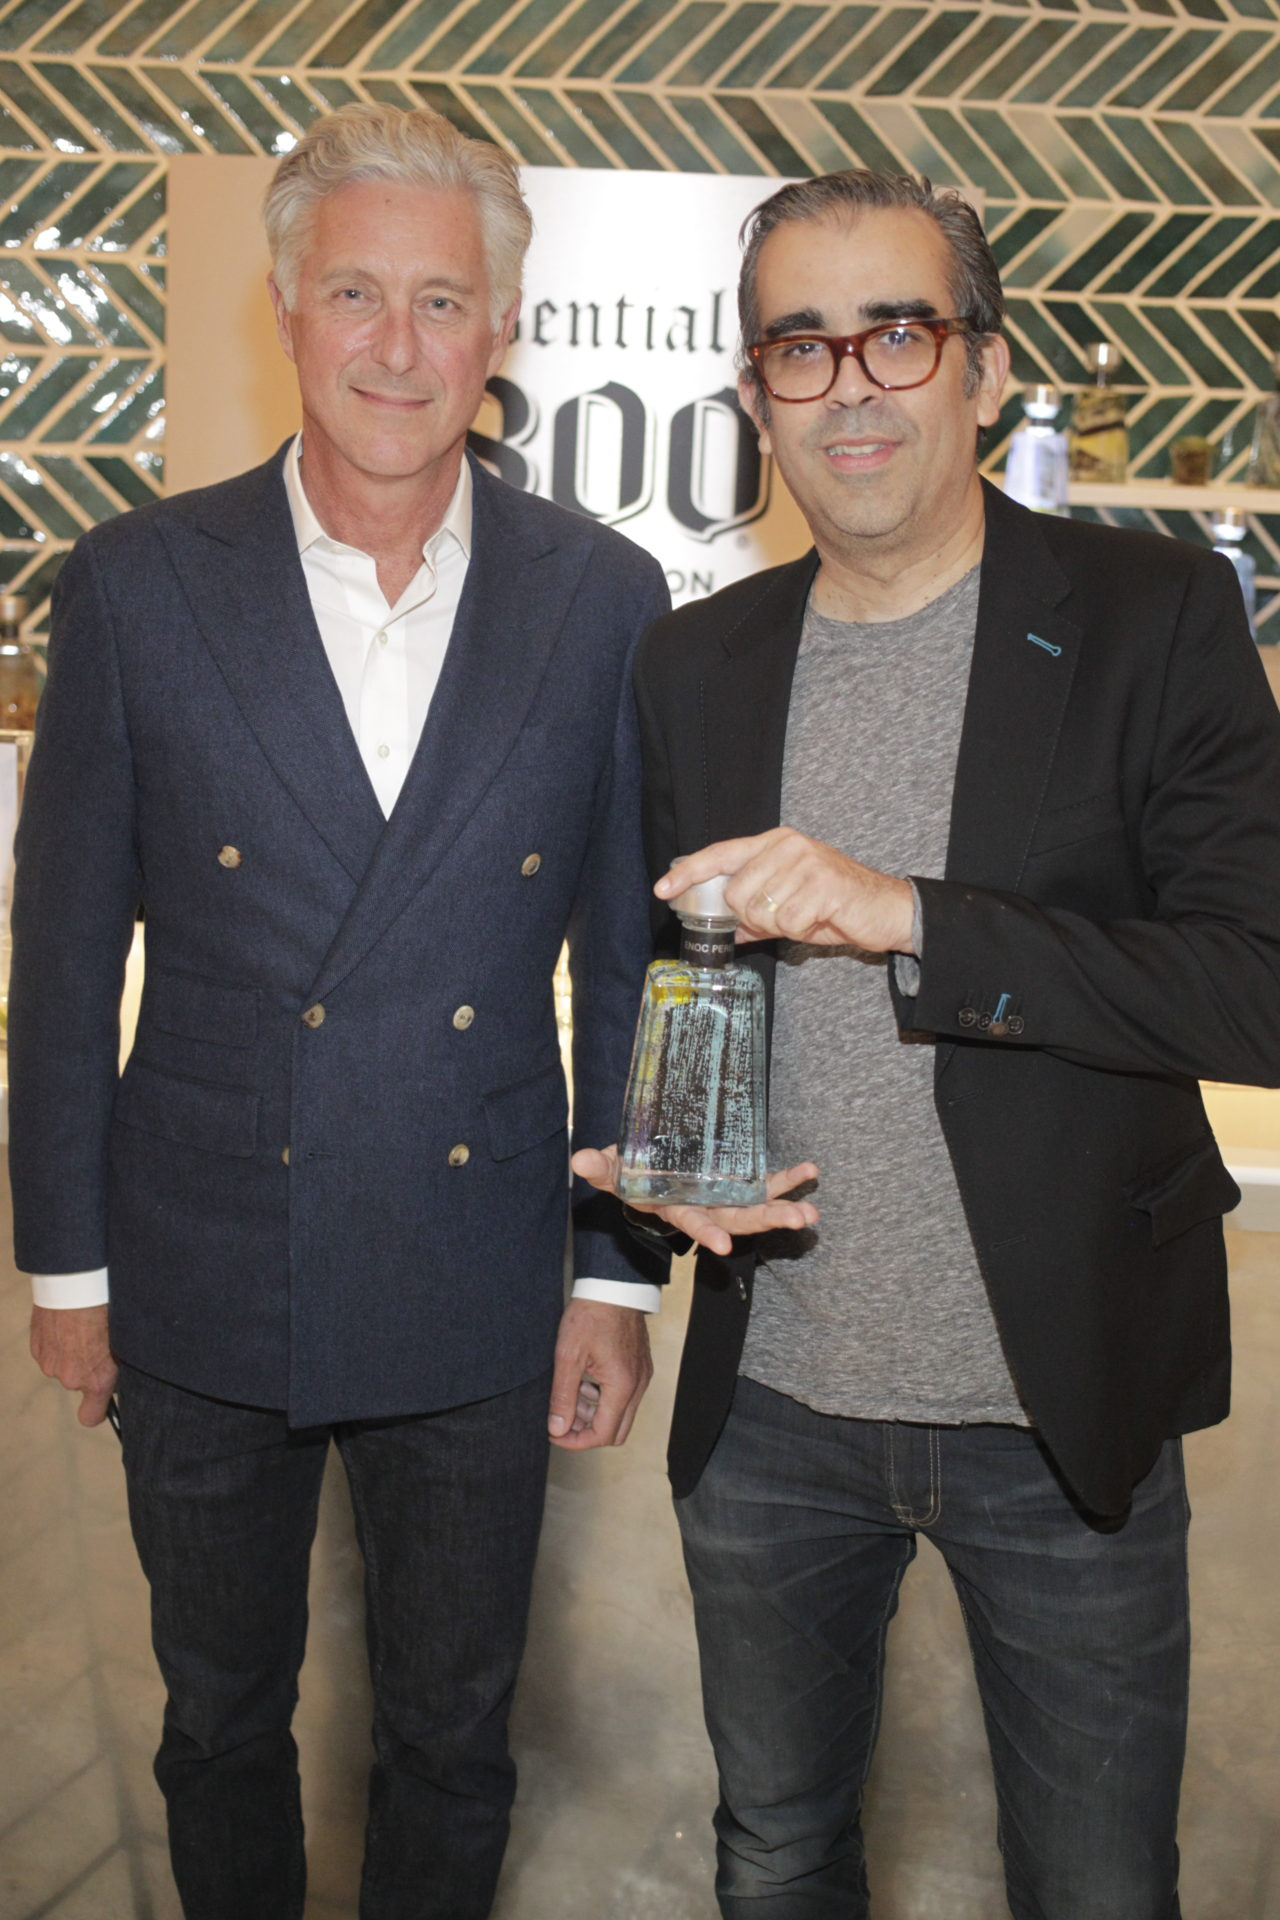 The Week in Art: The Frick Ball, Guggenheim Meets 1800 Tequila